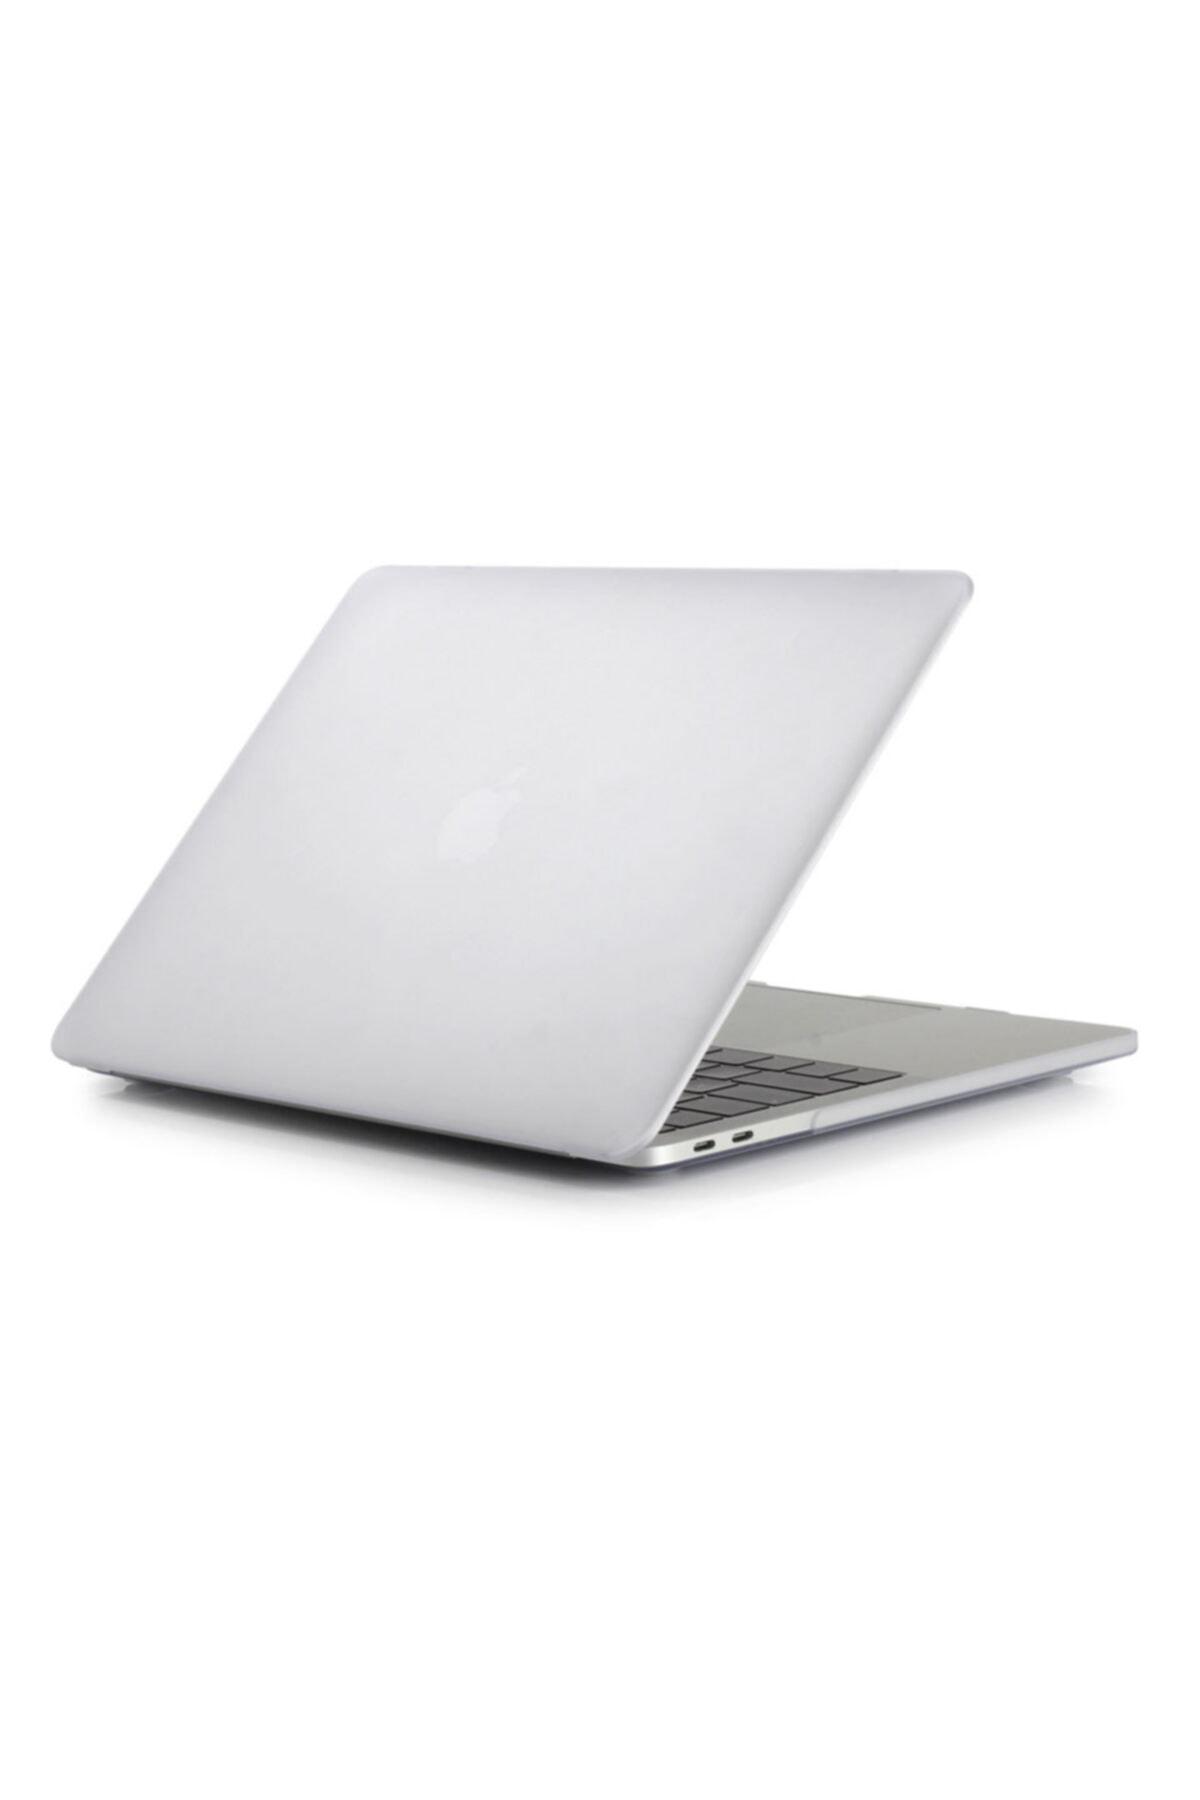 KIZILKAYA Apple Macbook Air 2020 Model A2179 13 Inç Touch Id Sert Kapak Koruma Kılıf Hardcase Mat 1